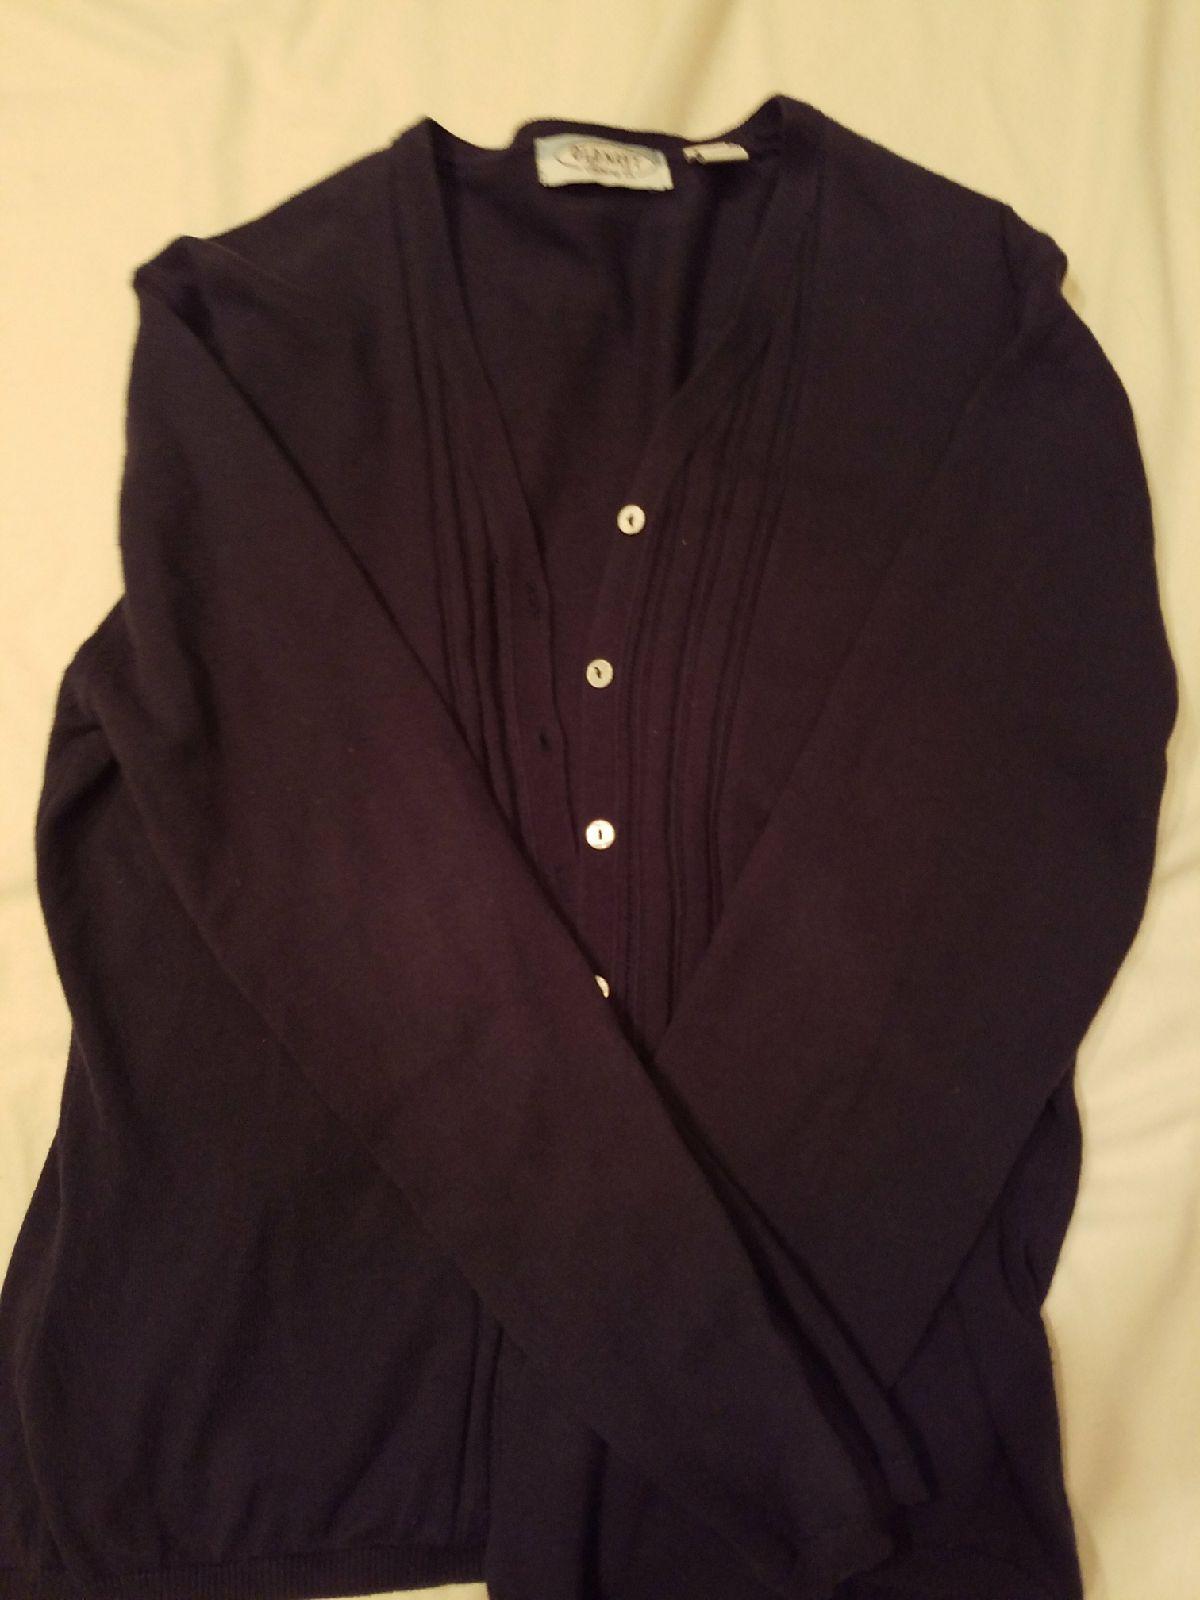 Old Navy Long Sleeve Cardigan - Mercari: BUY & SELL THINGS YOU LOVE